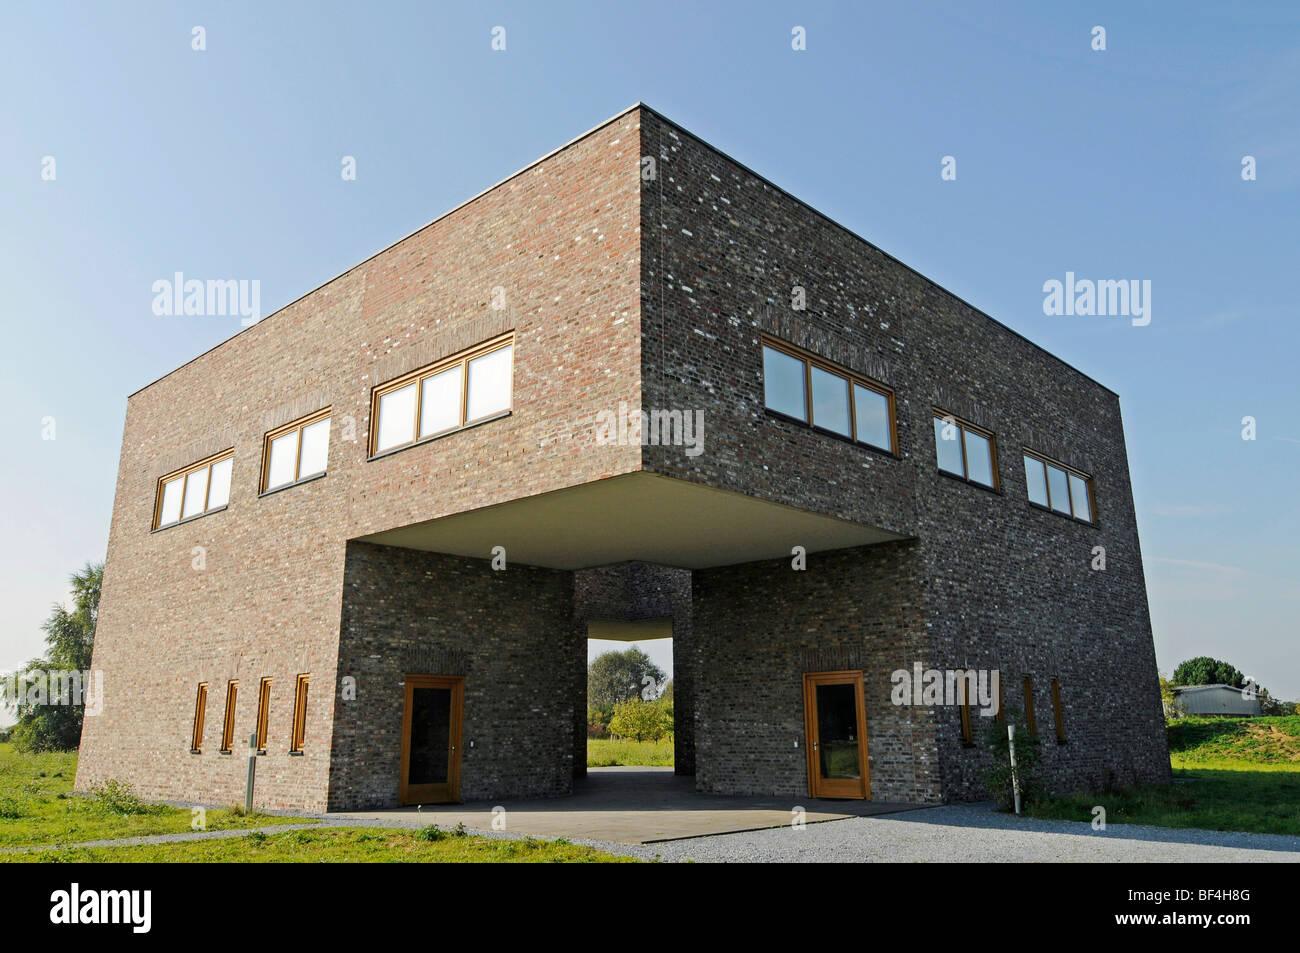 moderne architektur, bauen, ehemaligen raketen basis, kunstmuseum